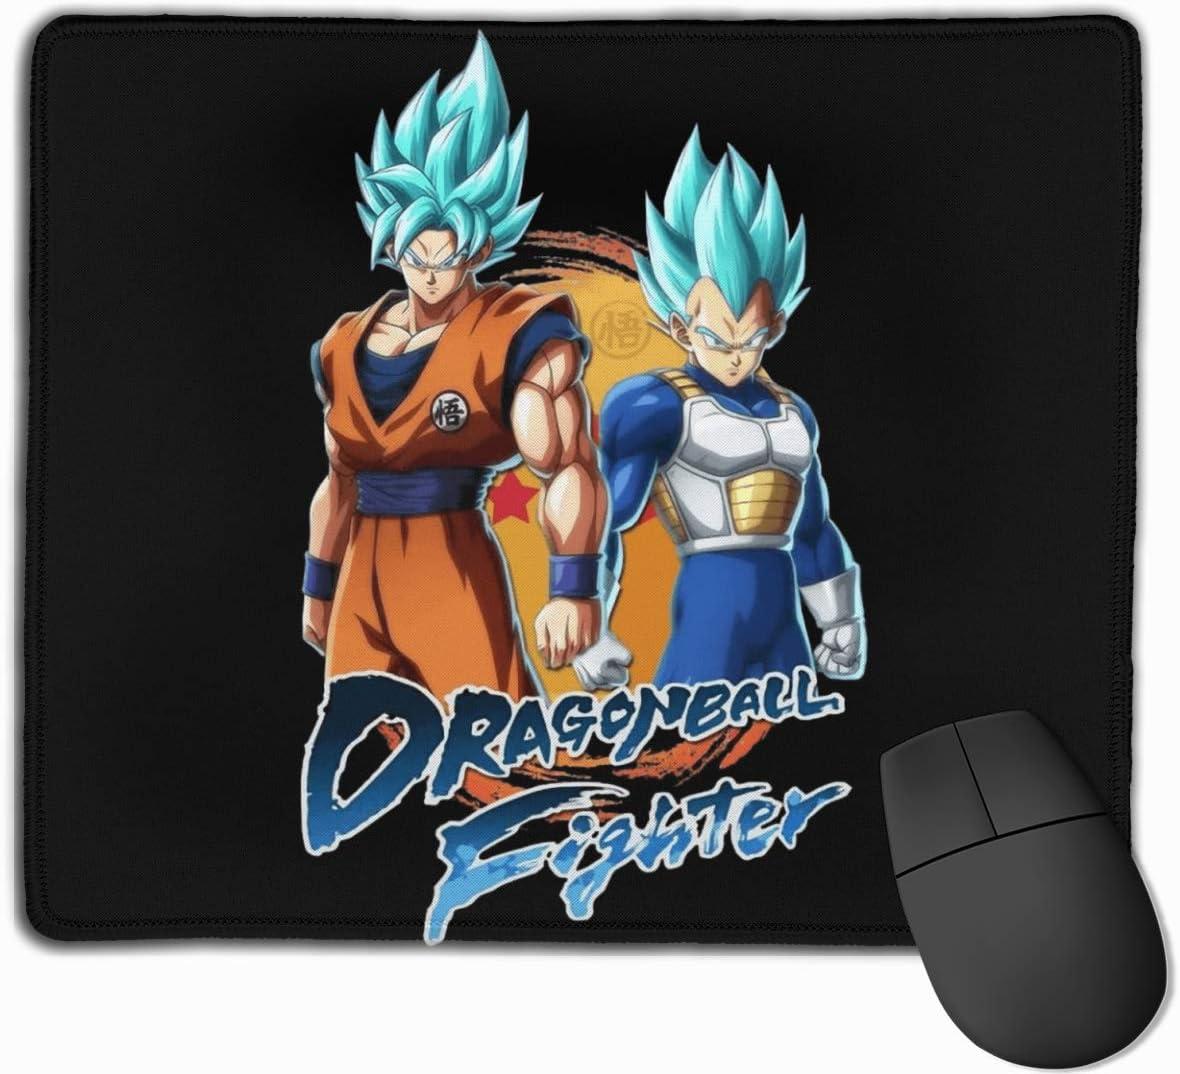 Mouse Pad Gaming Dragon Ball Goku Vegeta Fighter Computer ...